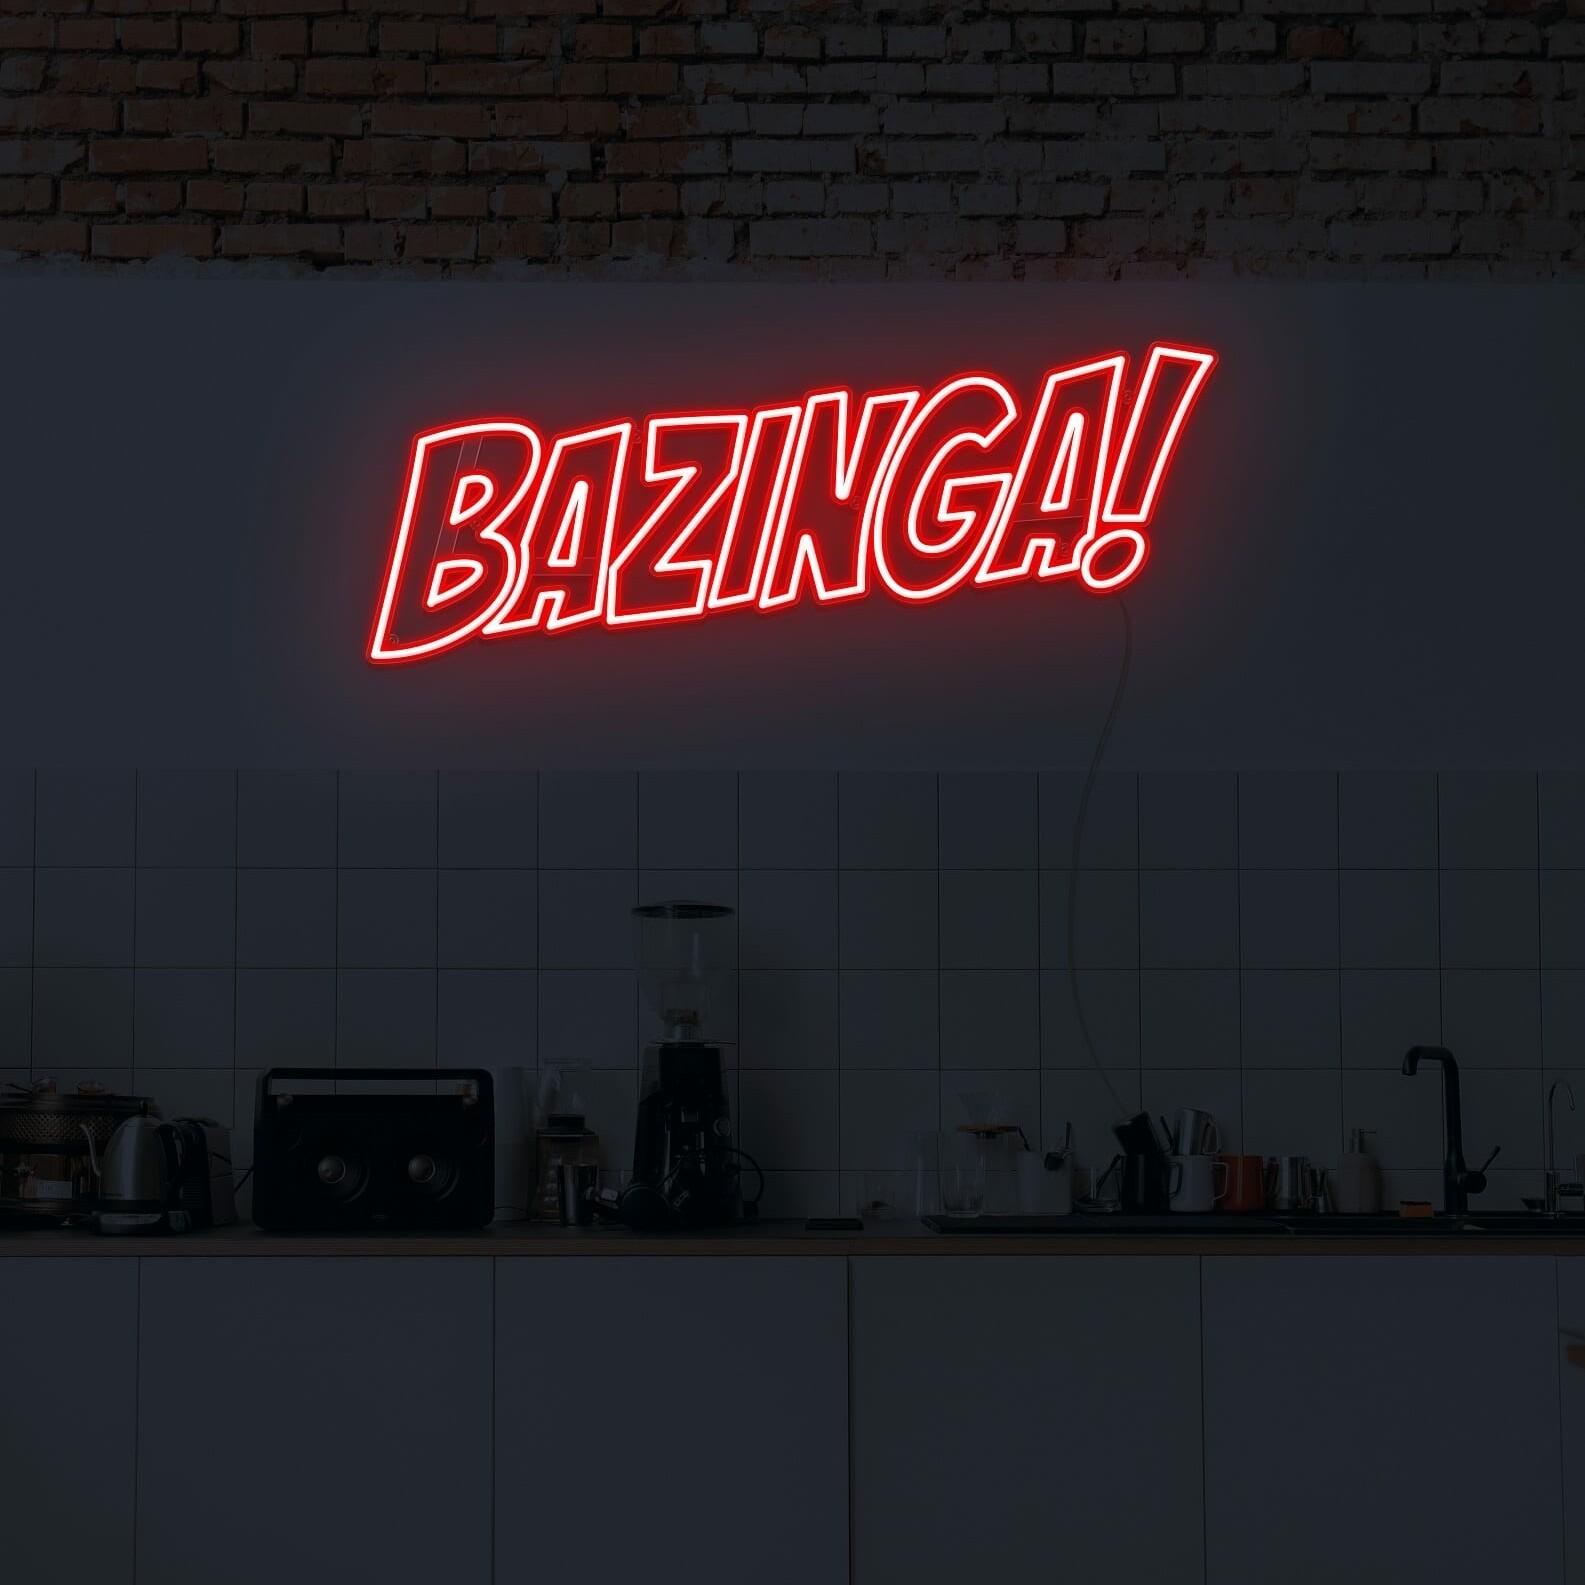 Bazinga neon light